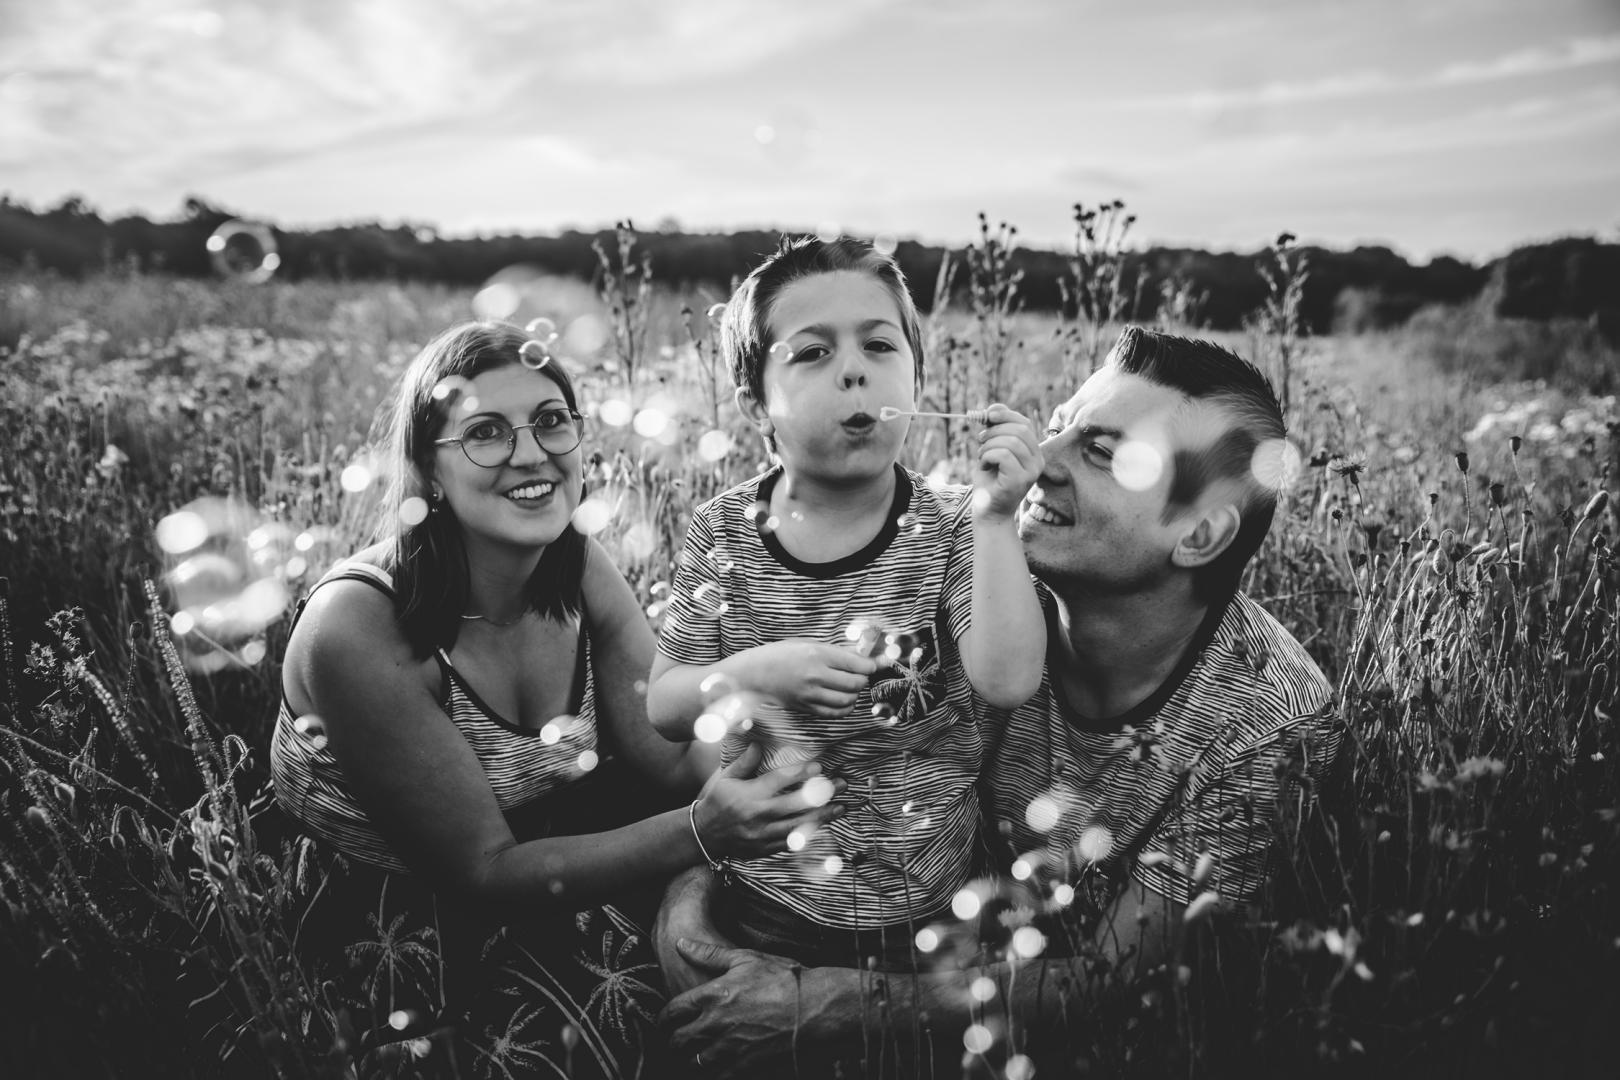 Photographe Famille Mulhouse - Photographe Famille Haut-Rhin - Photographe Famille Alsace - Photographe enfant Mulhouse- Bertrand DISDIER